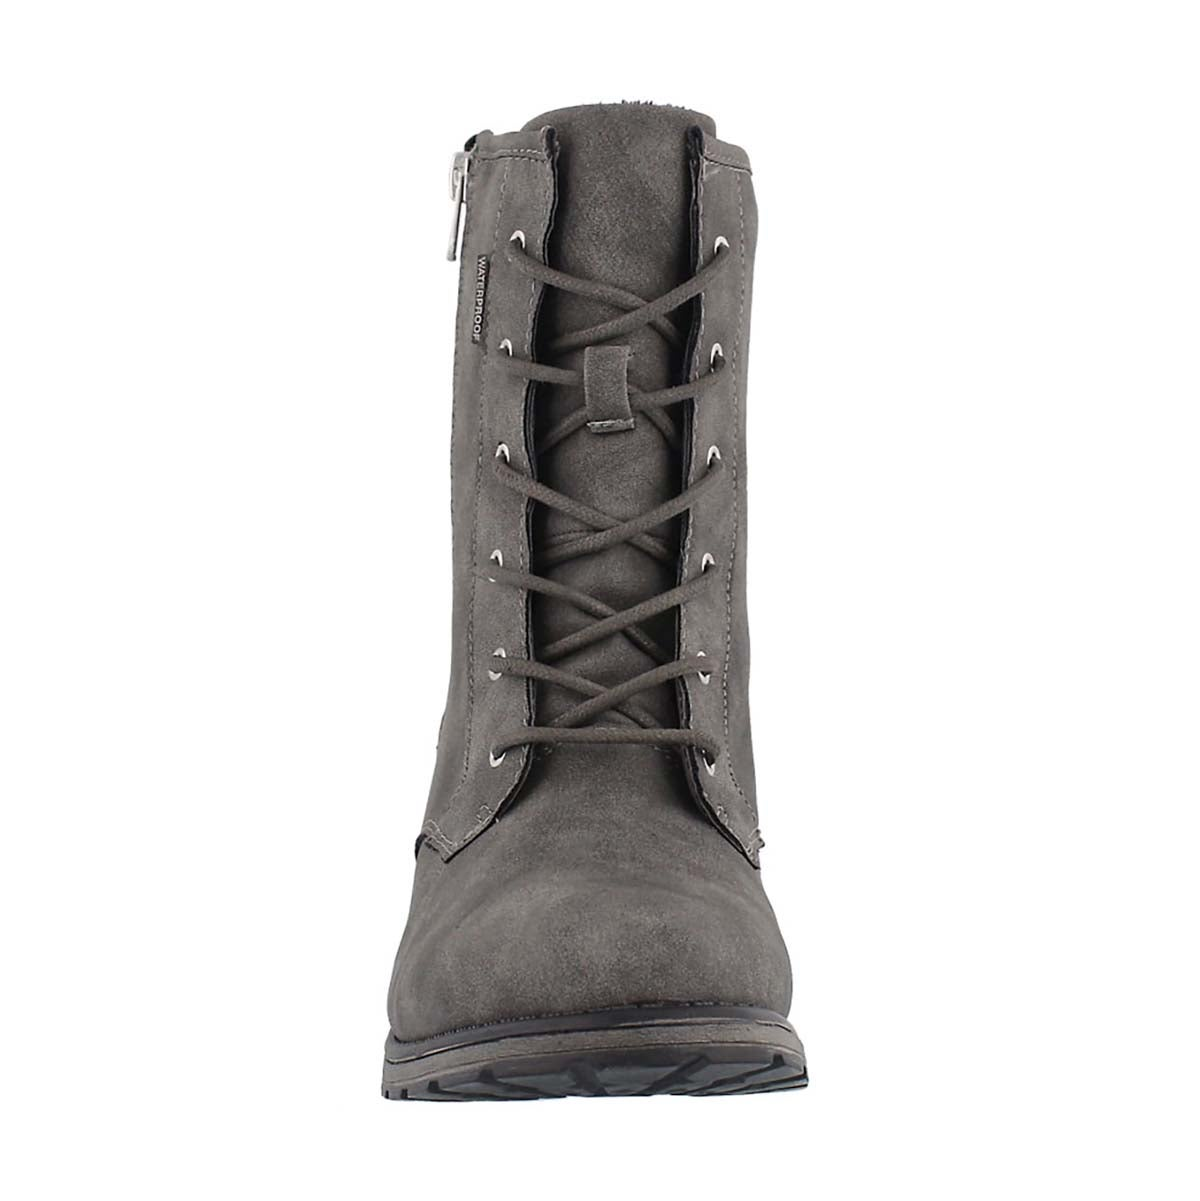 Grls Nera ash wpf combat boot